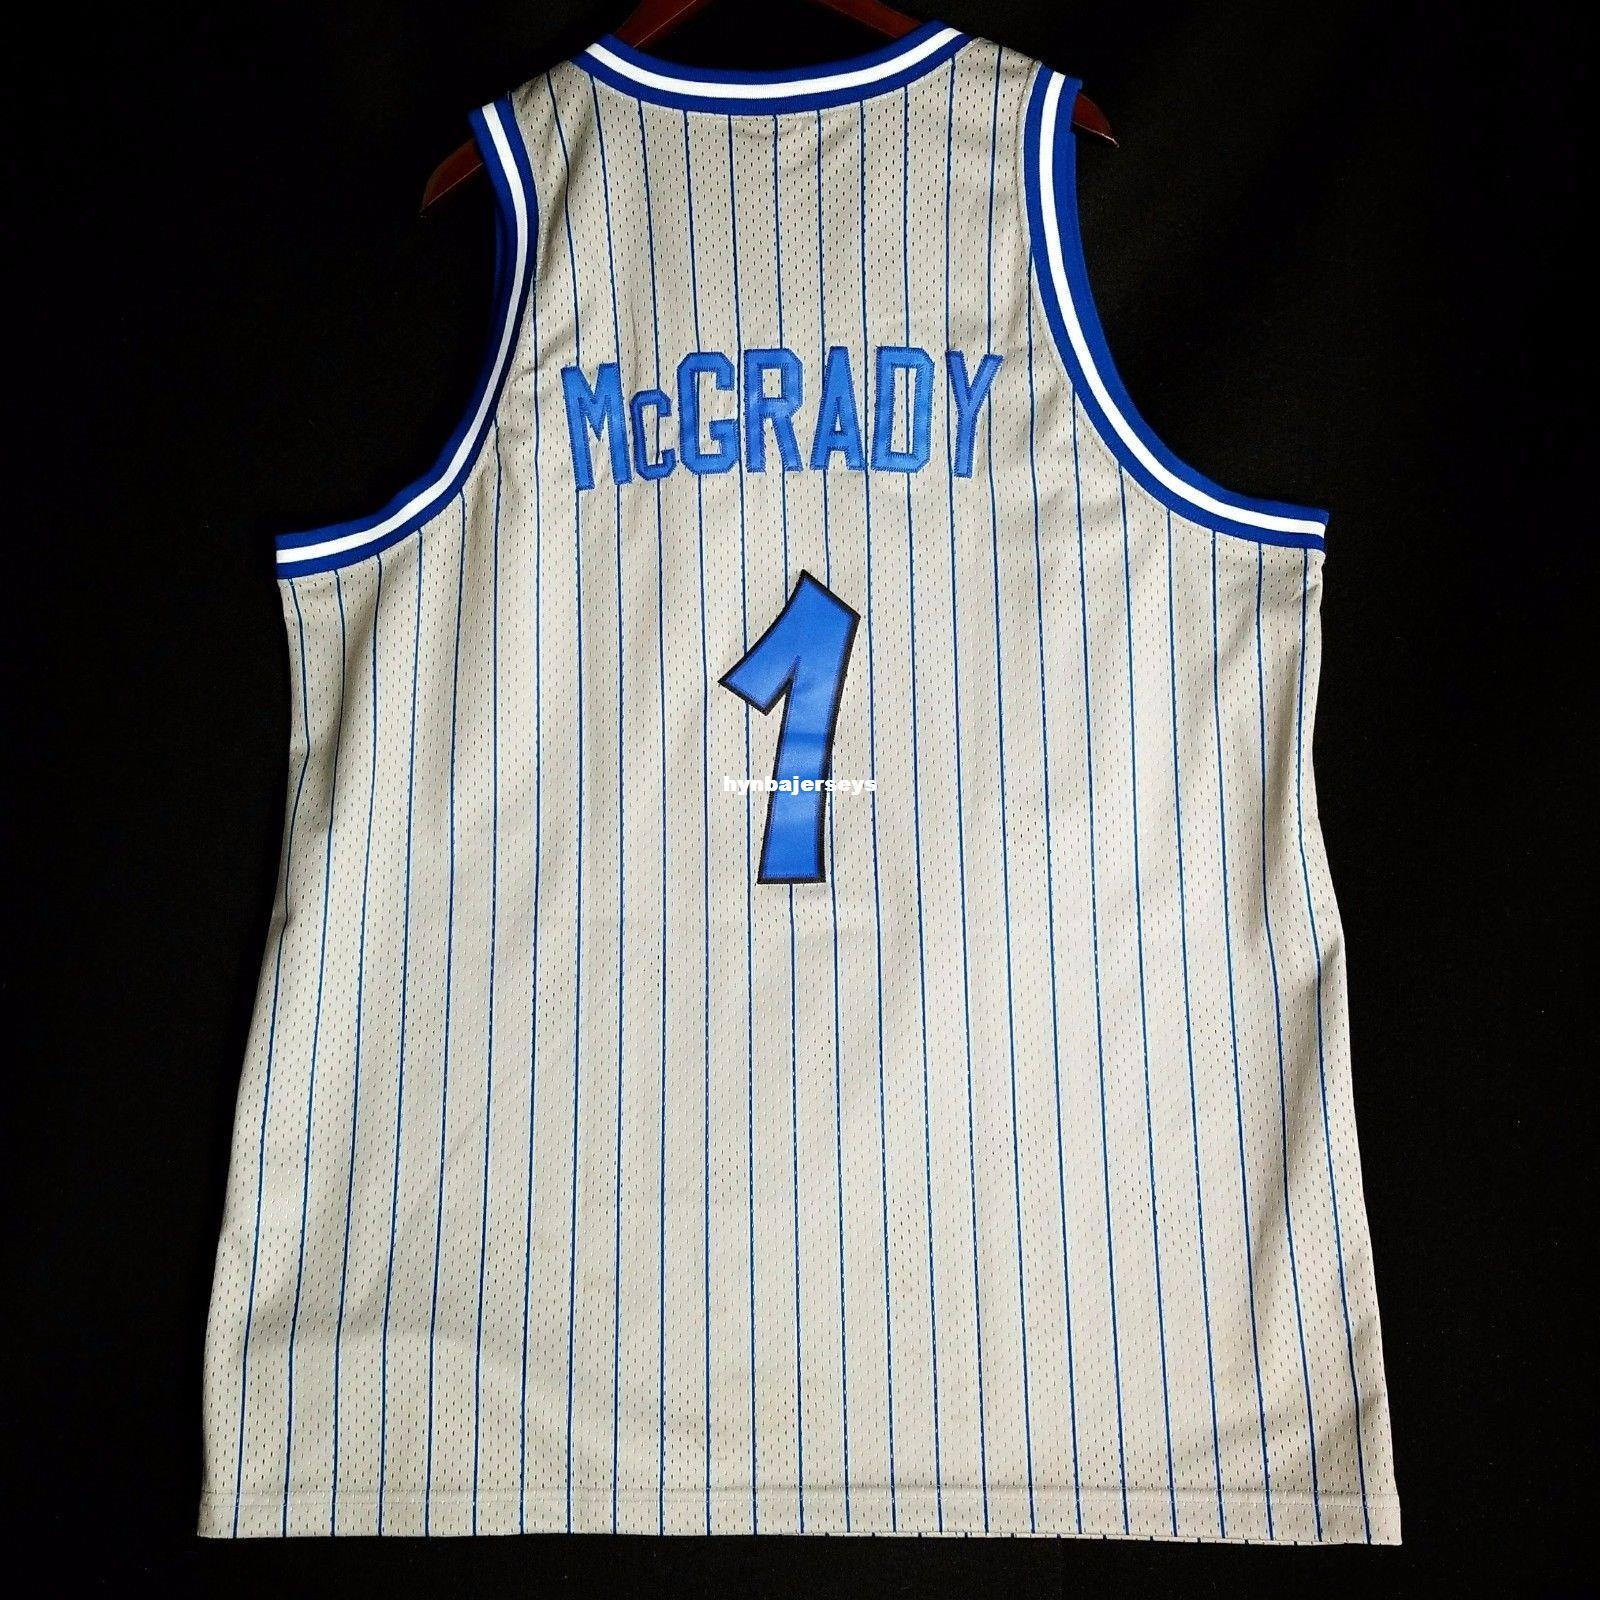 Throwbacks 100% Stitched Tracy Mcgrady  1 Sewn Jersey White Mens ... da8f798ab